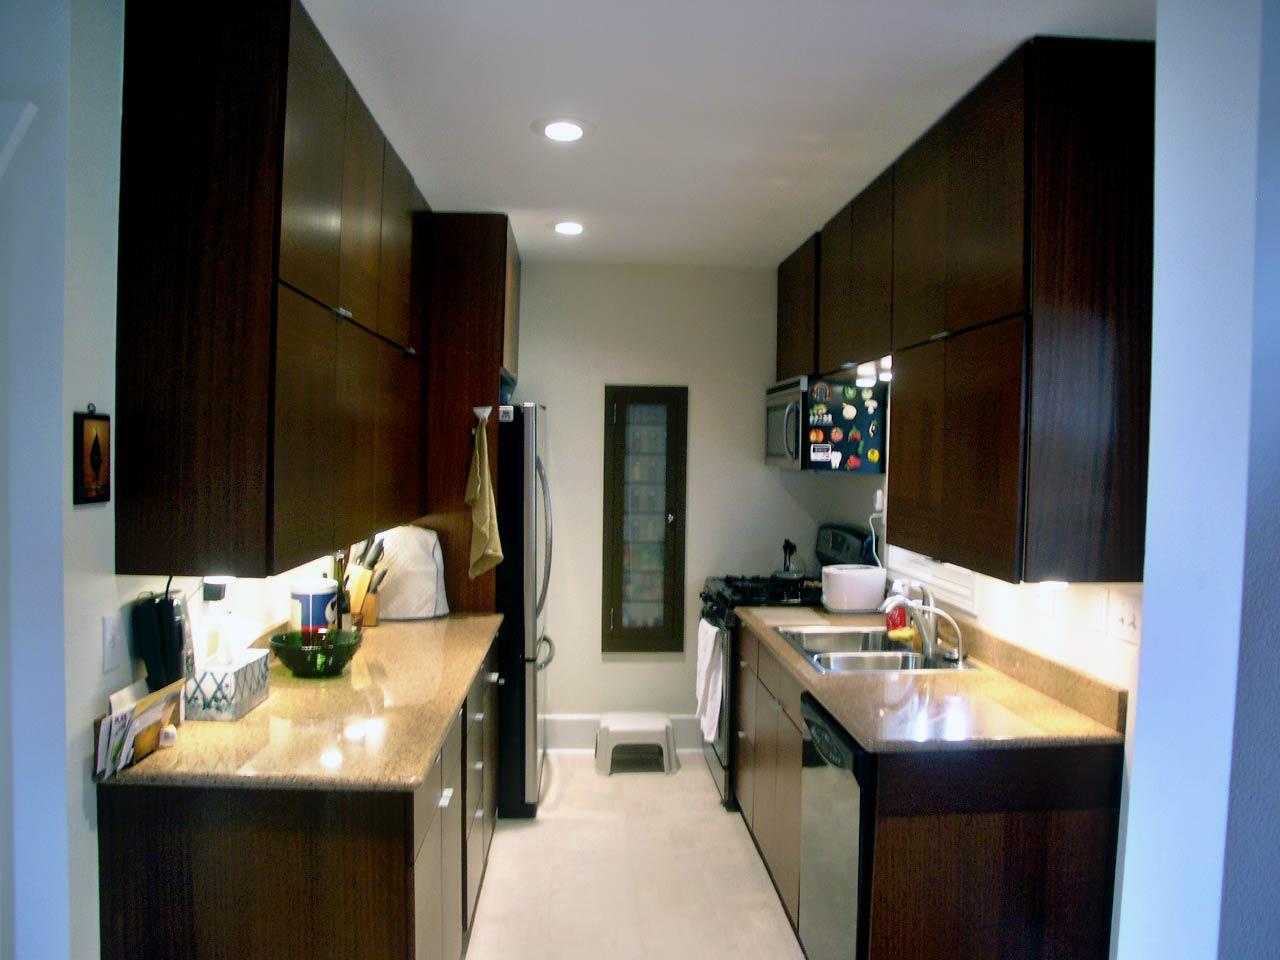 Hermson Kitchen Remodel